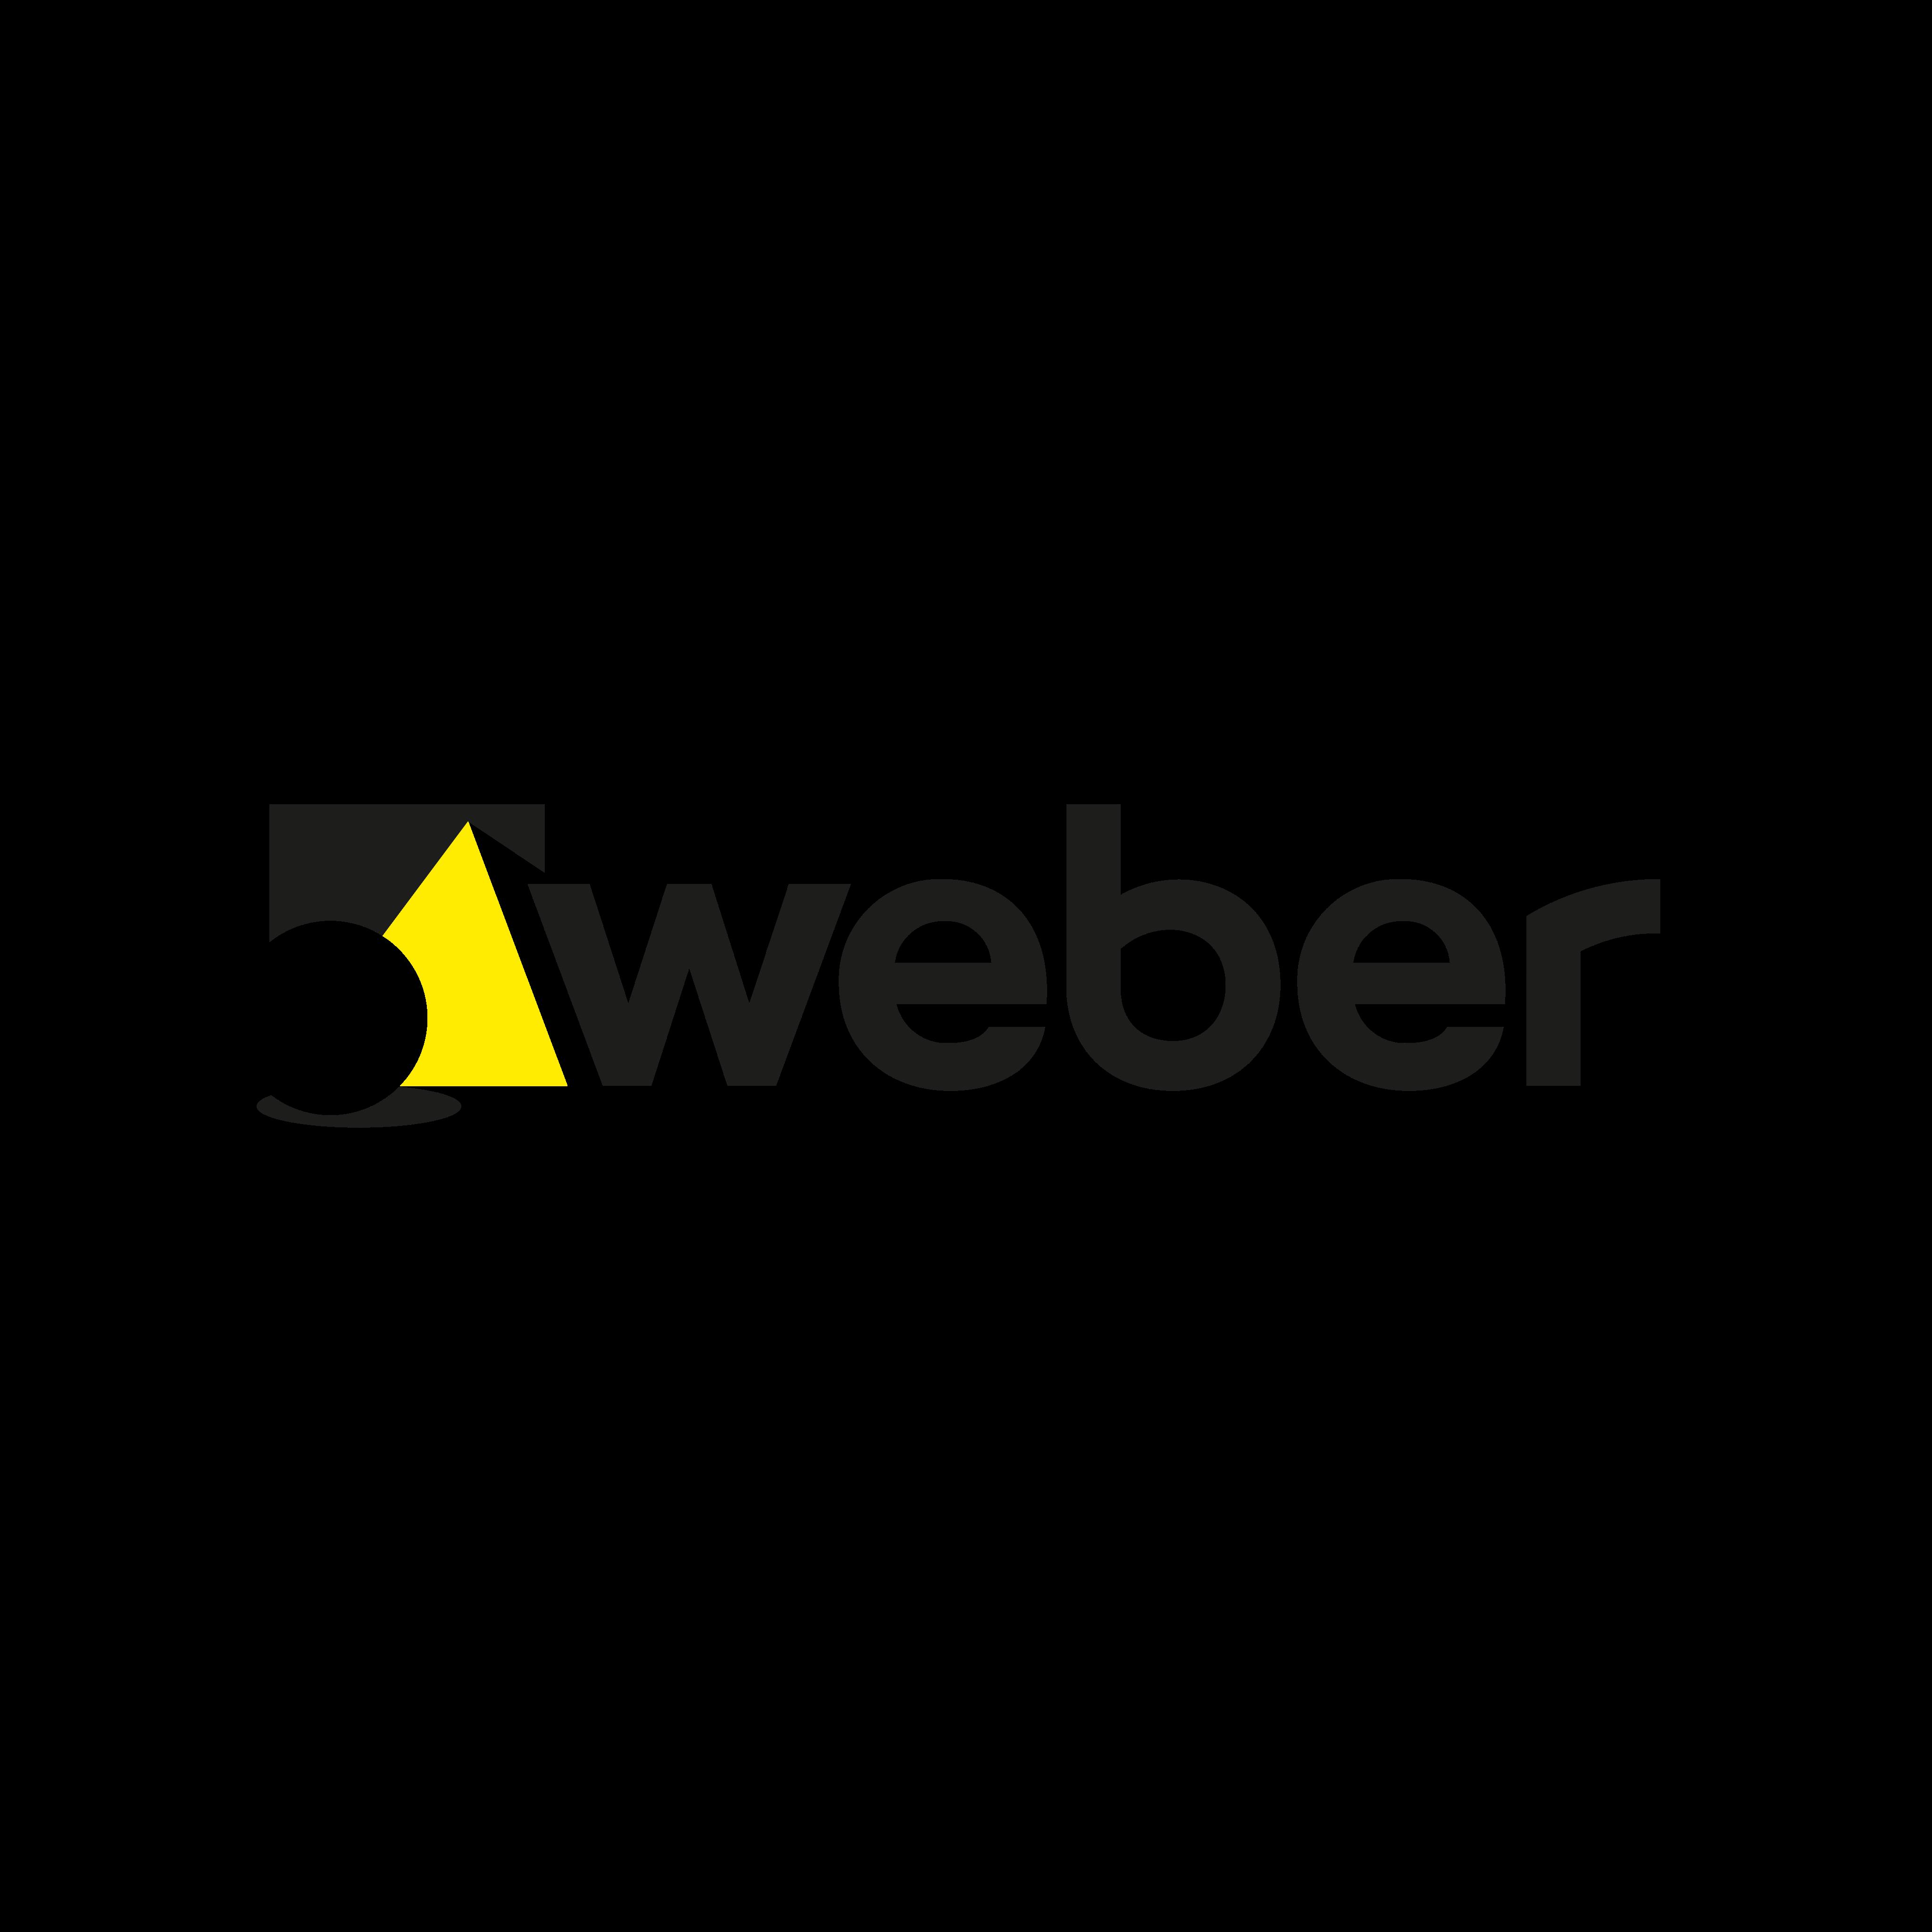 Weber Saint-Gobain Logo PNG.